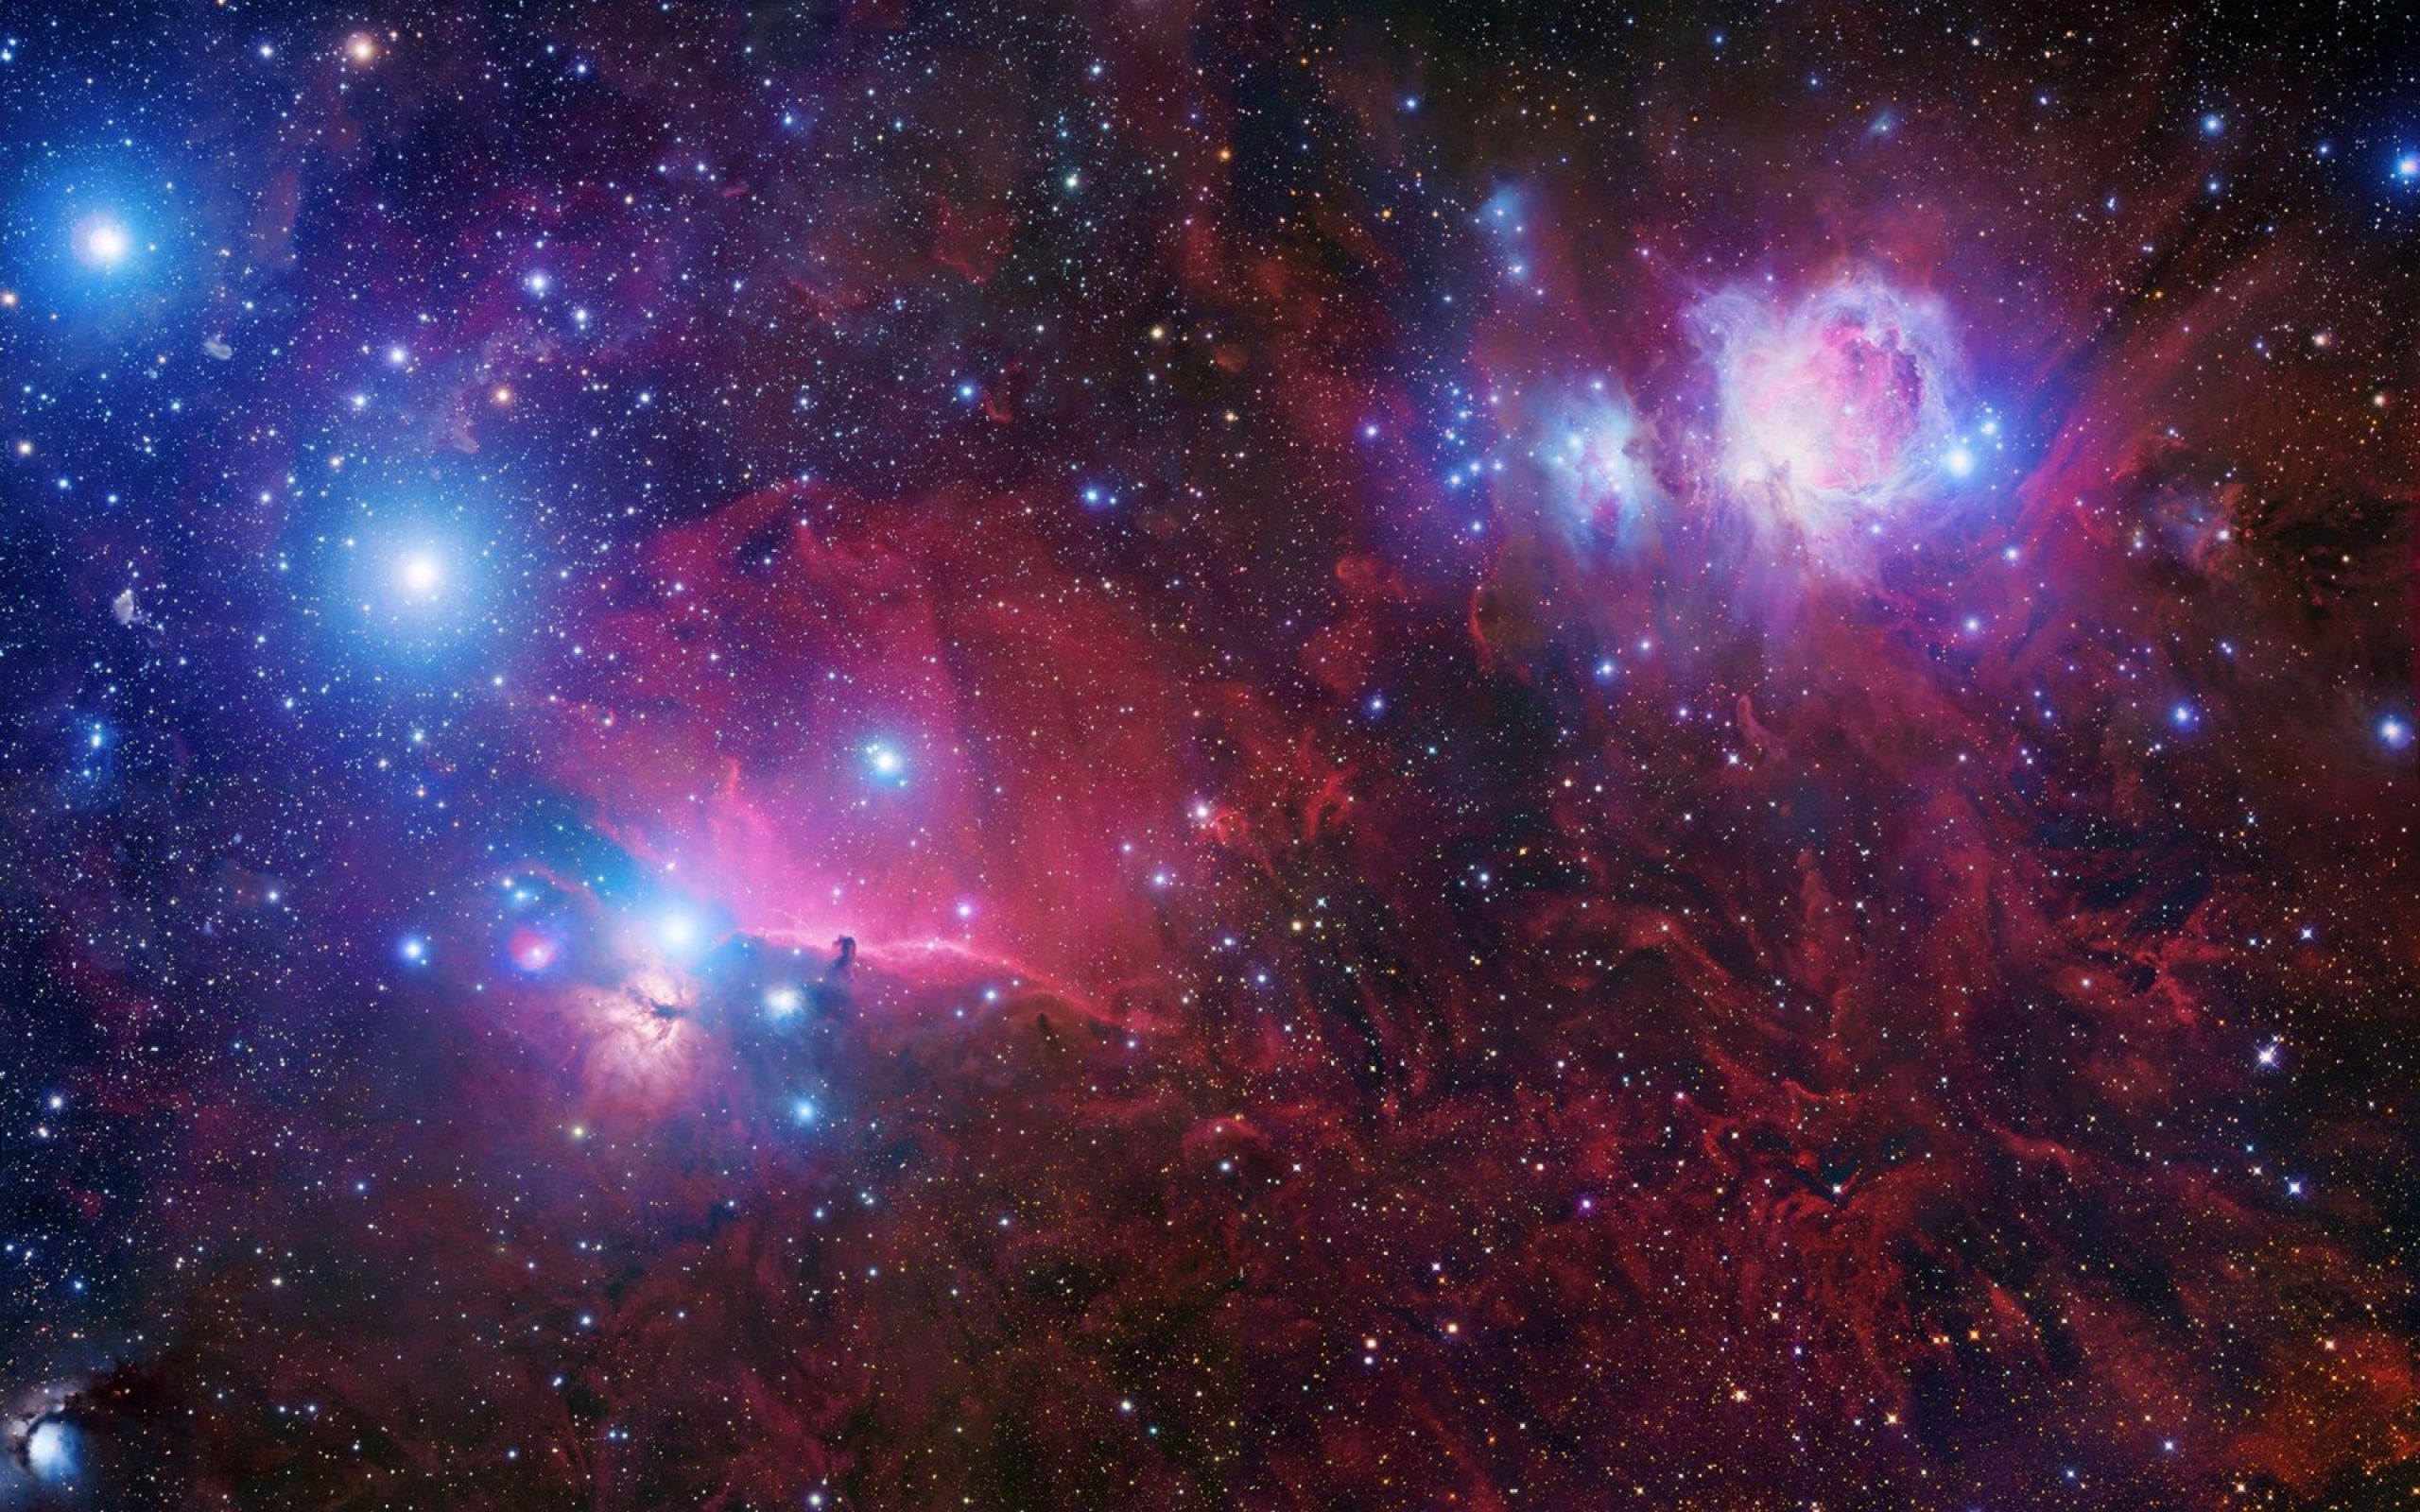 galaxy-wallpaper-31